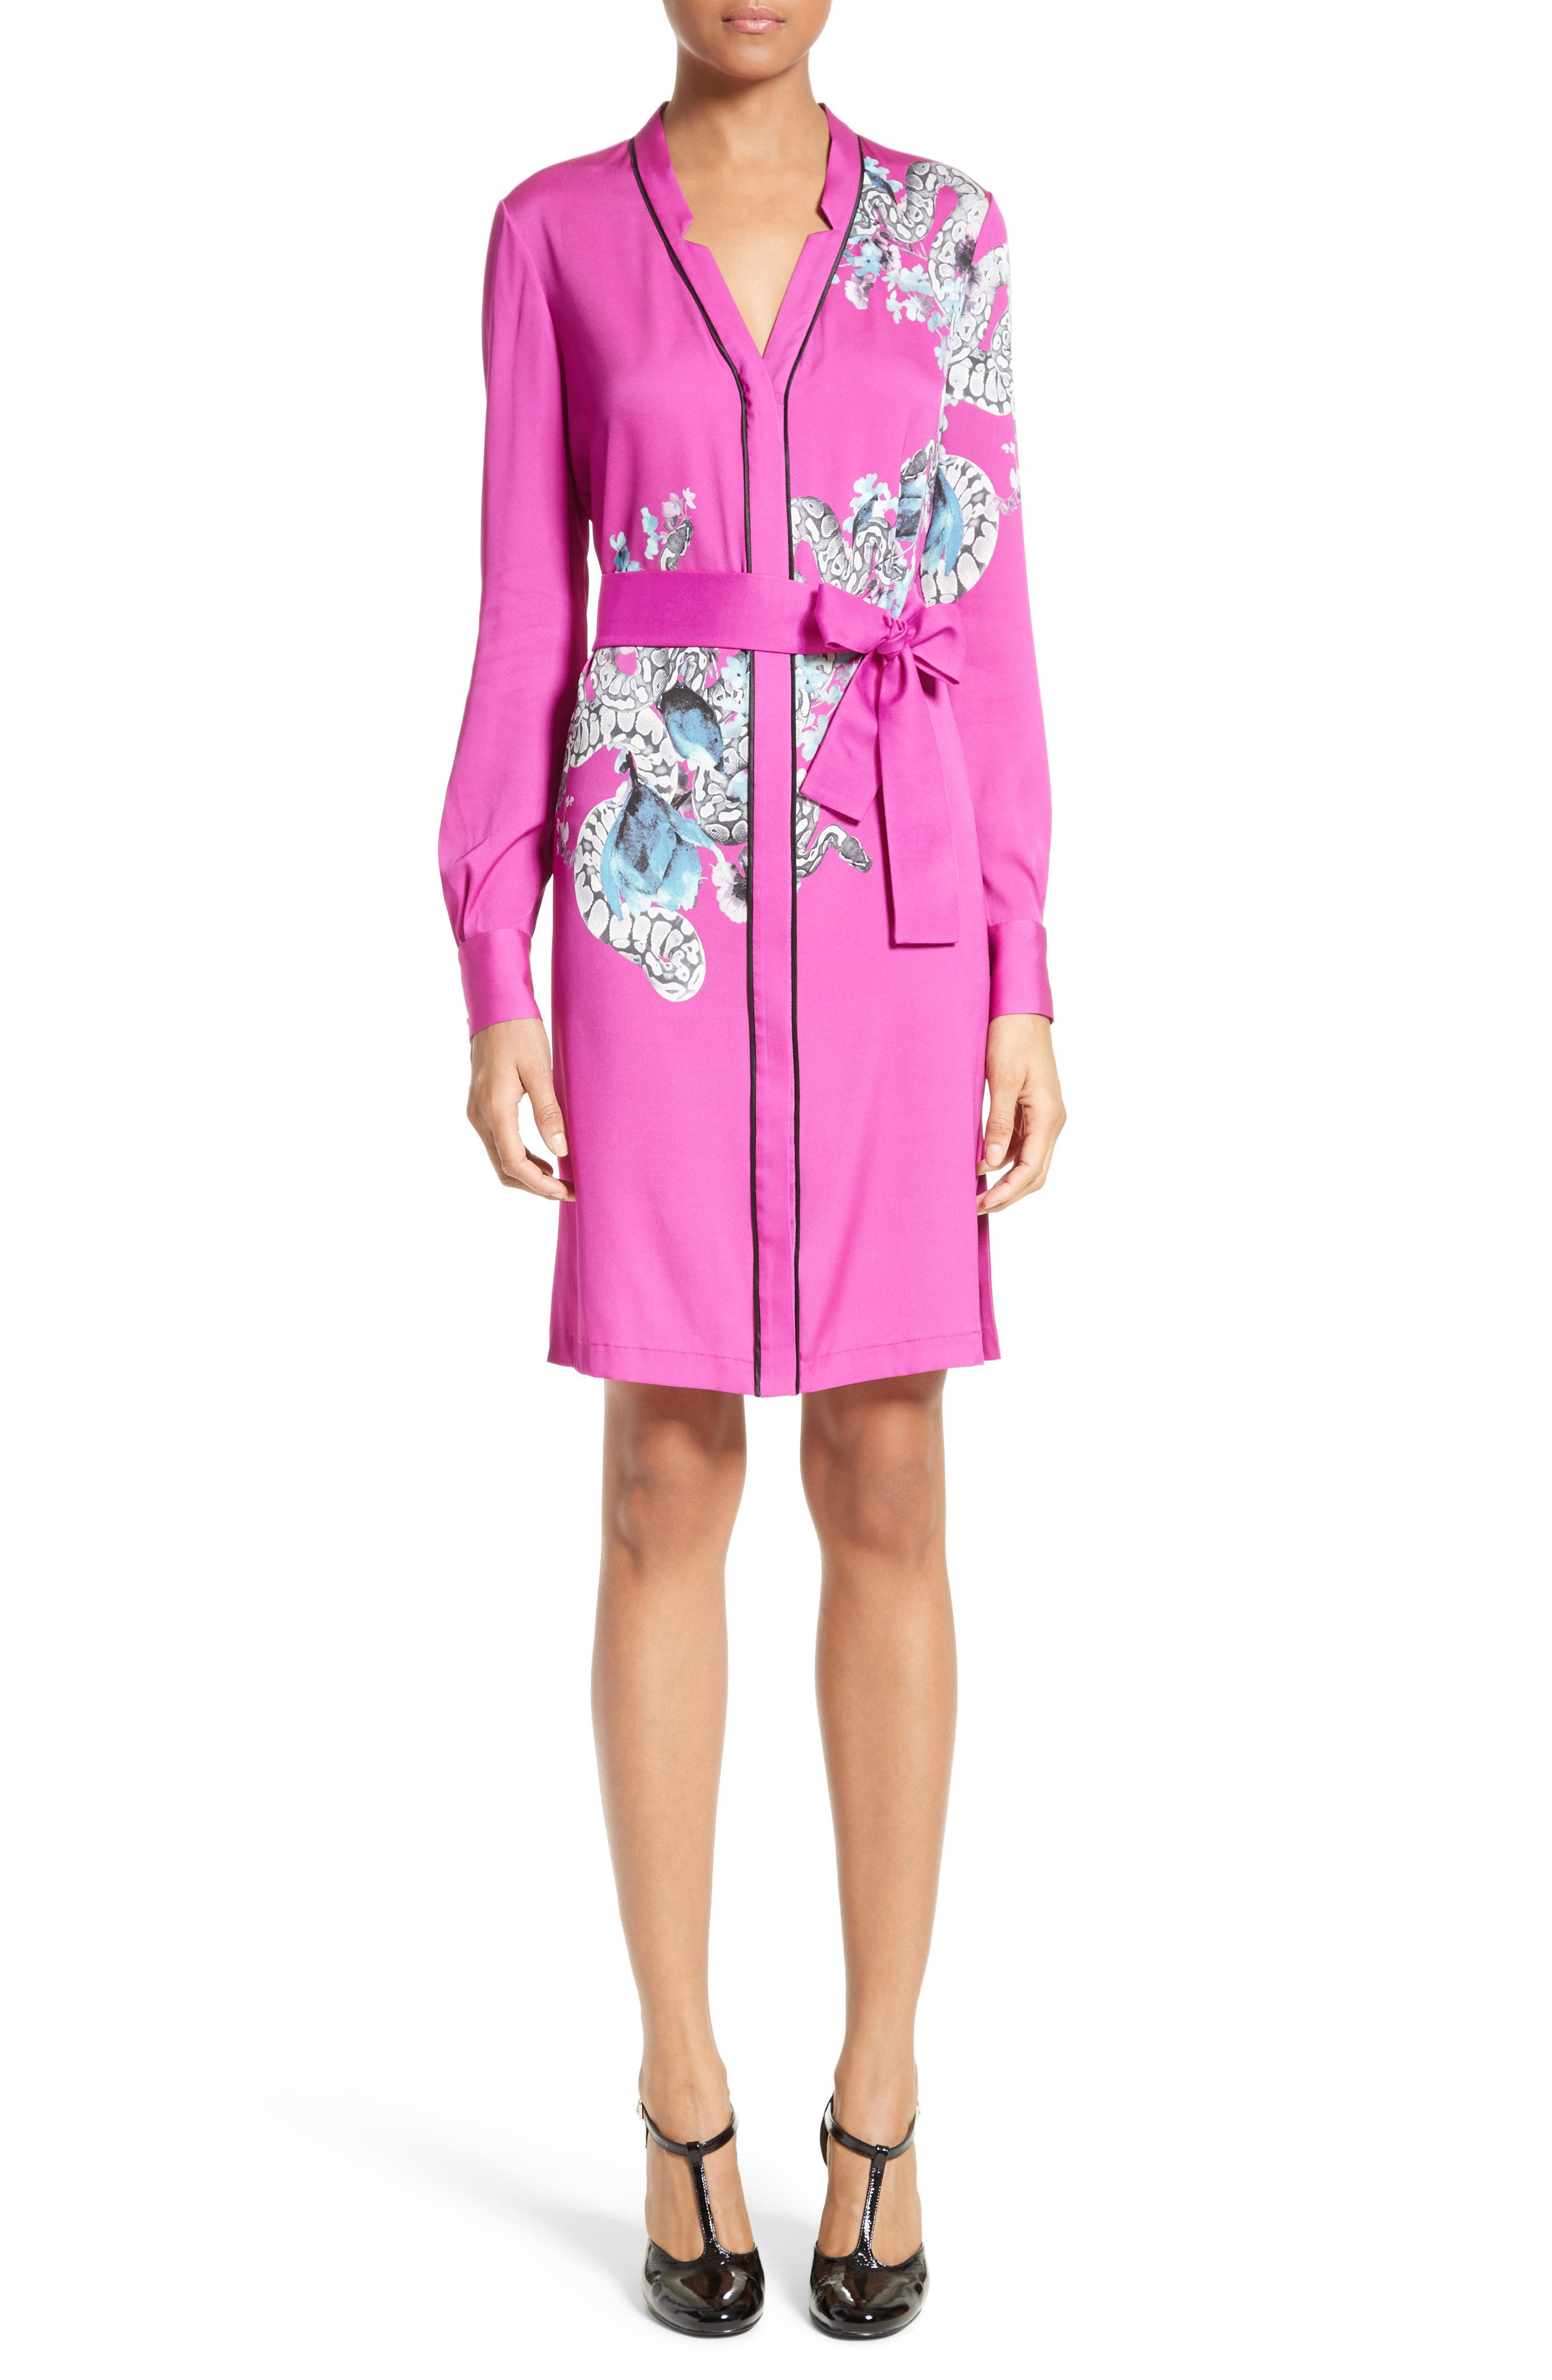 Yigal Azrouël Floral Pajama Dress